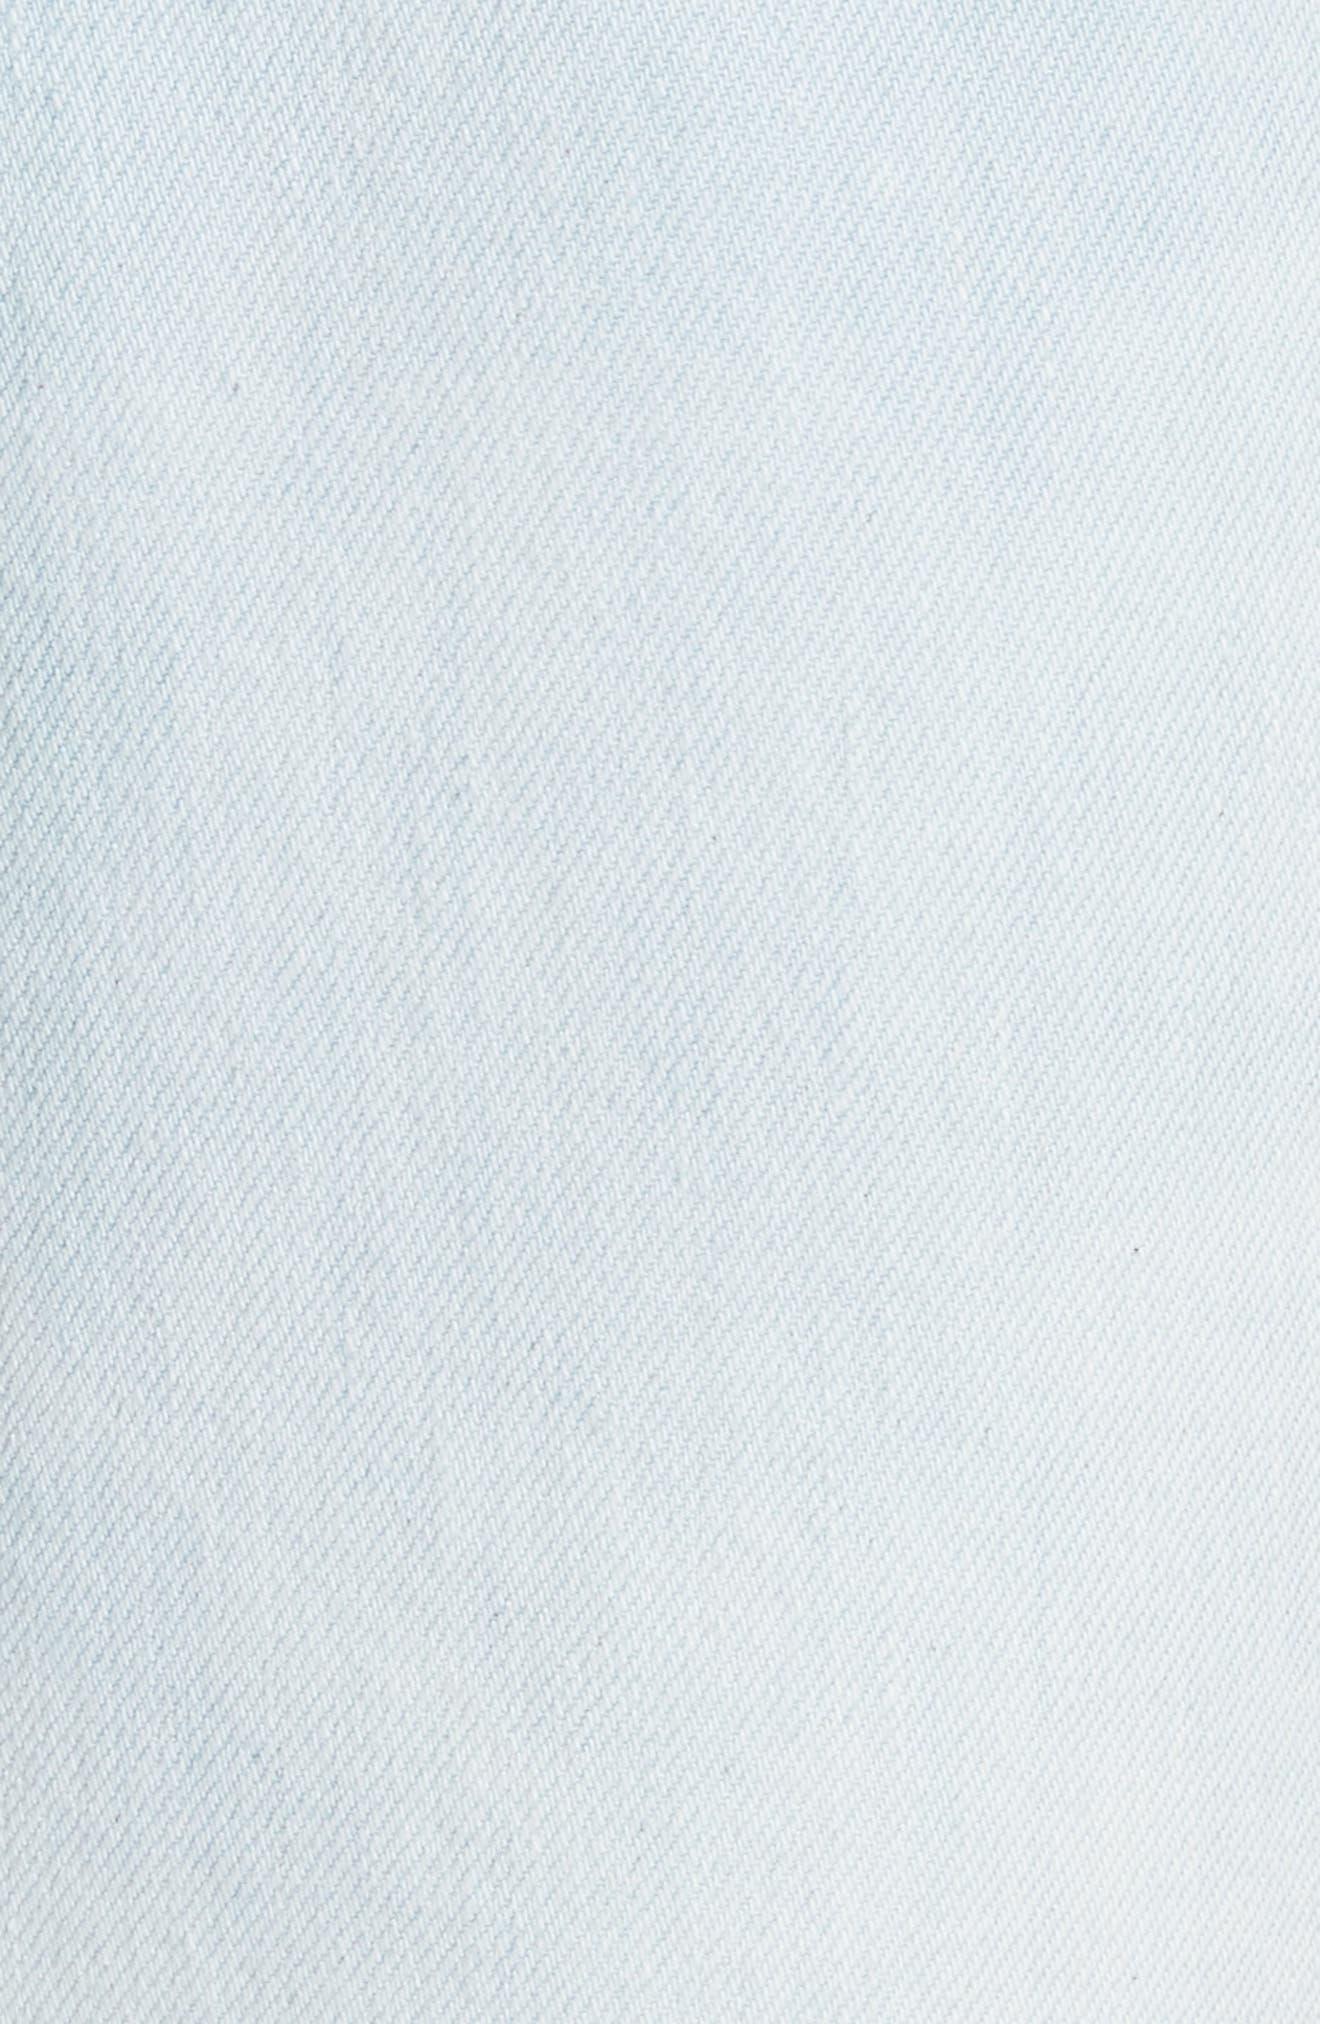 Alternate Image 5  - La Vie Rebecca Taylor Crop Wide Leg Jeans (Nuage Wash)